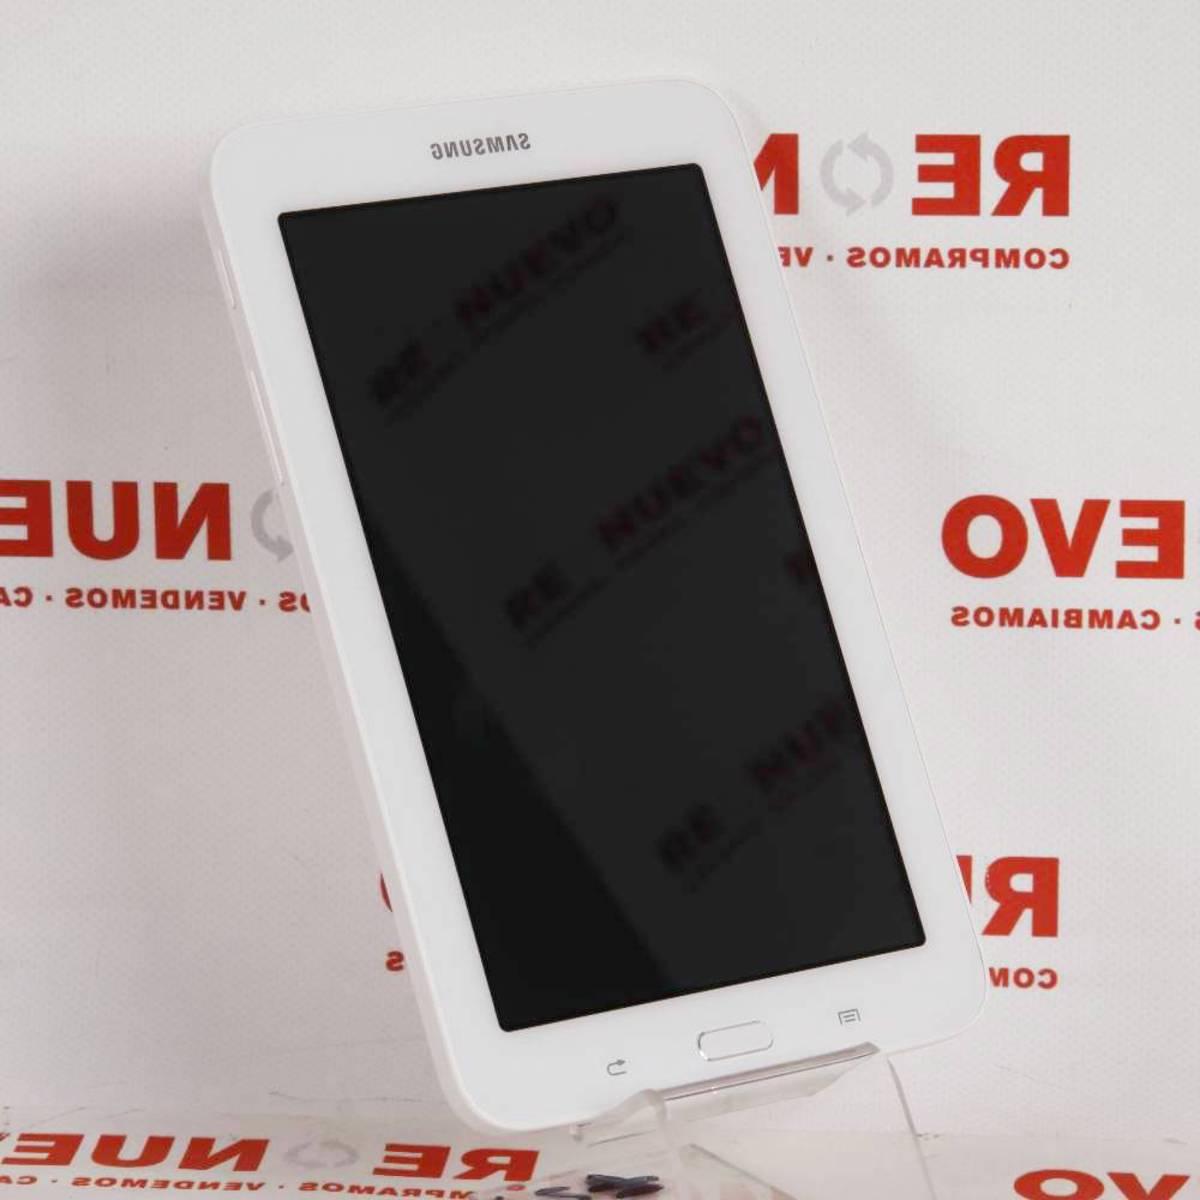 Tables De Segunda Mano Etdg Tablet Samsung Tab 3 8gb Wifi E Renuevo Tienda Online De